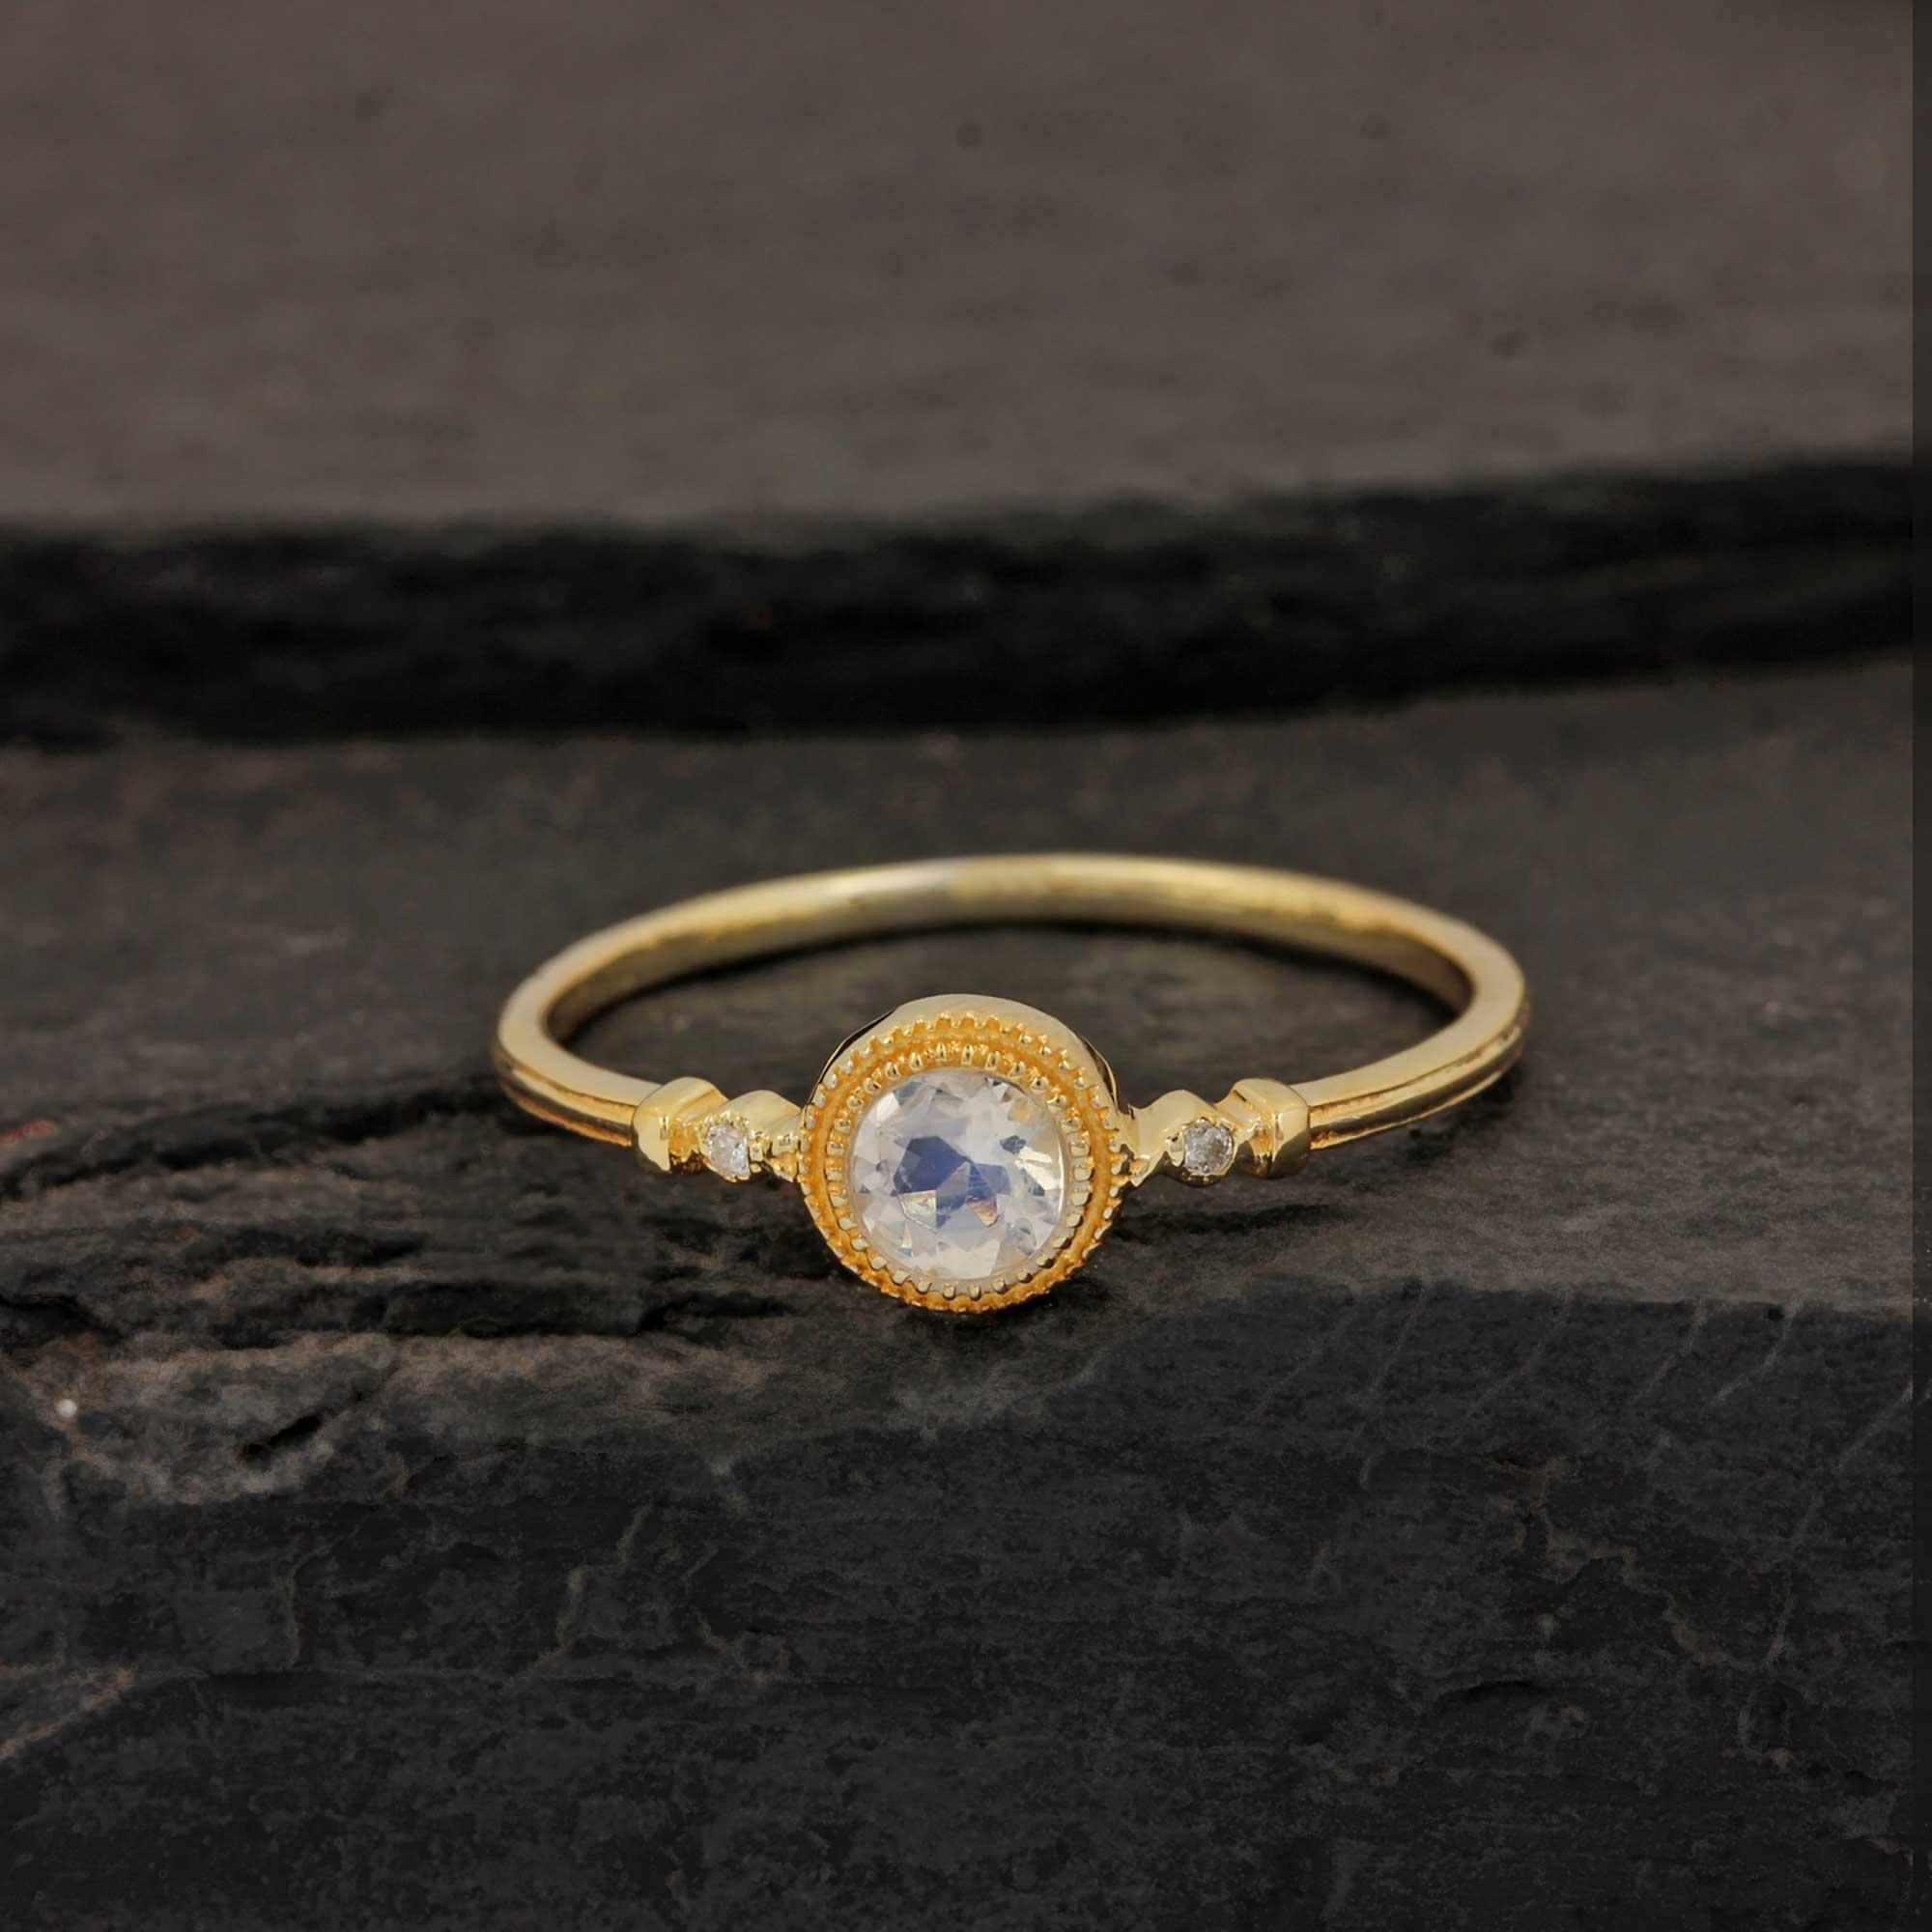 14k Solid Gold Diamond Minimalist Moonstone Ring